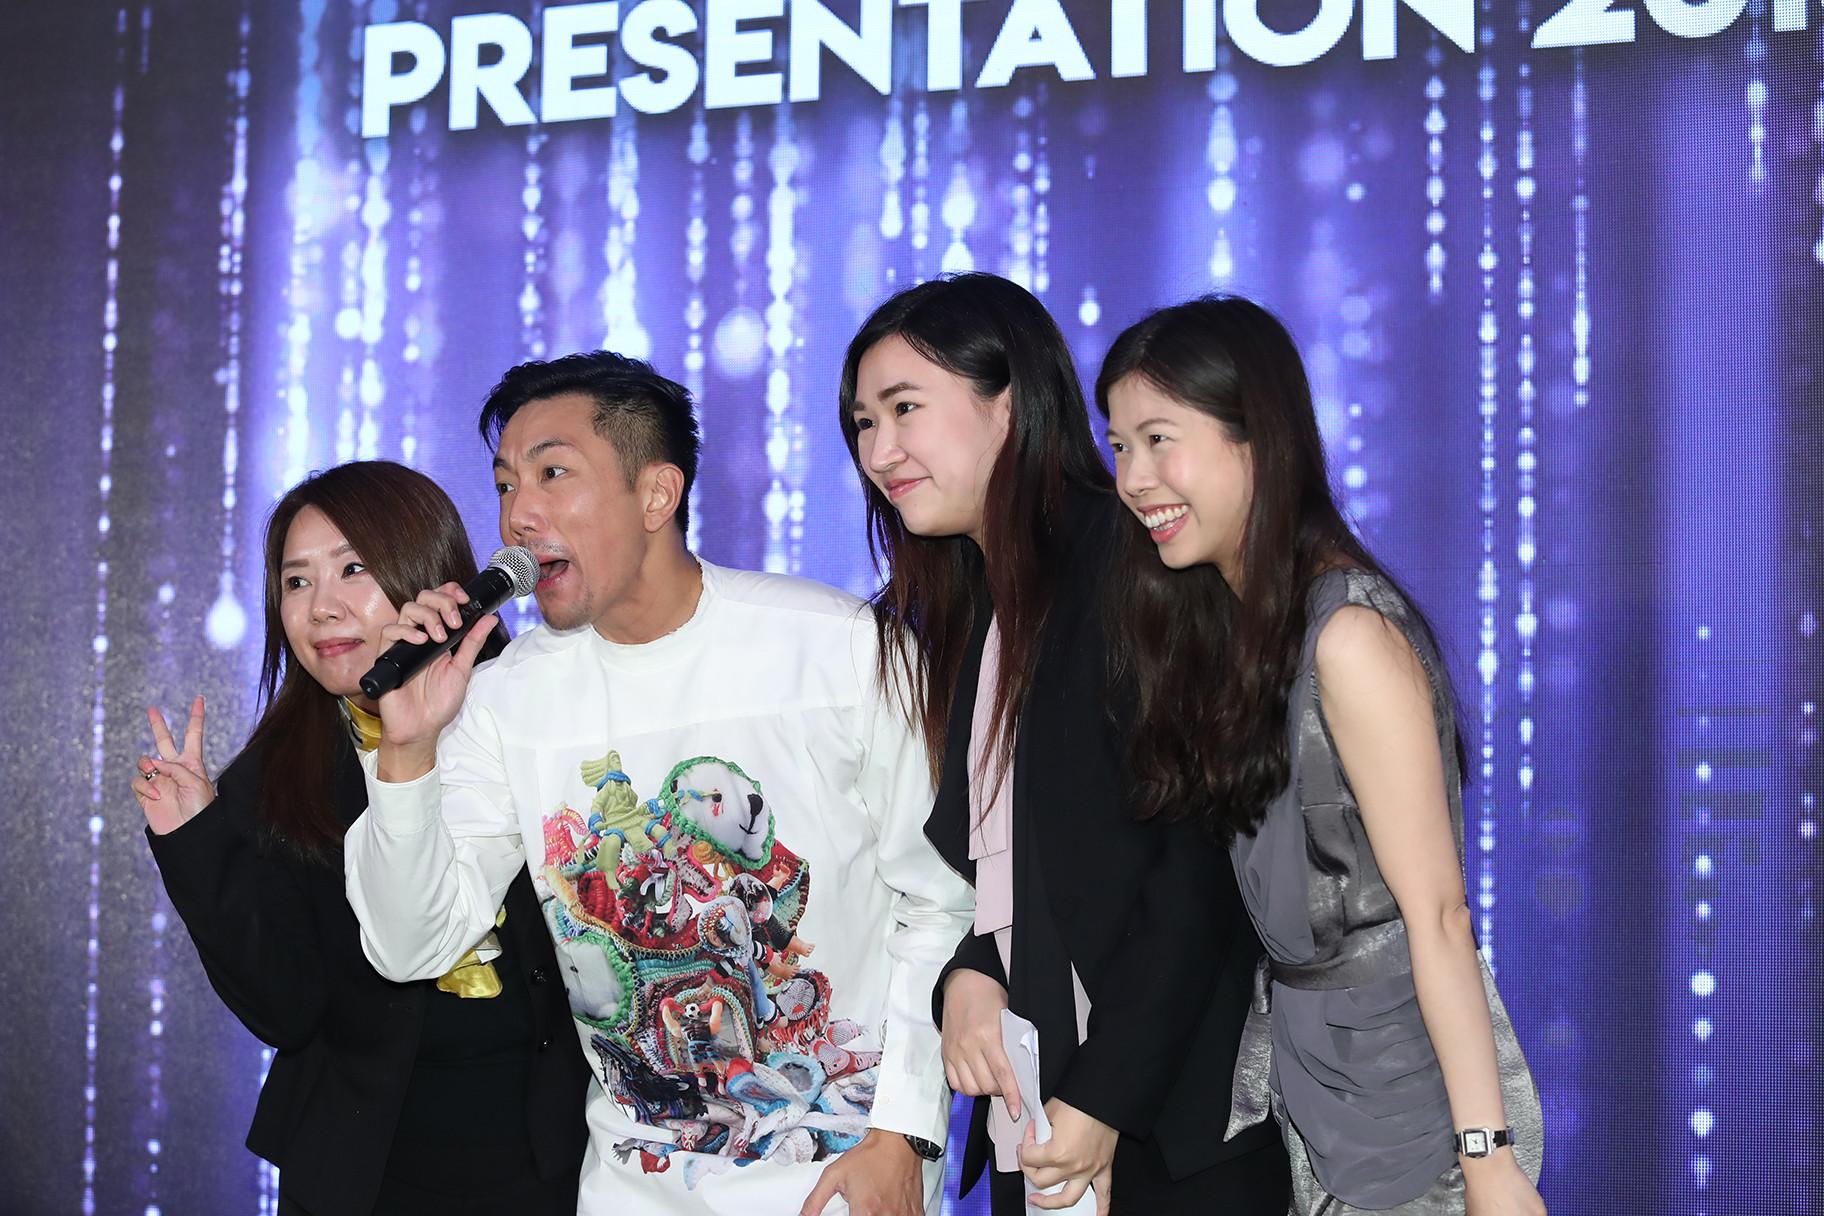 Hong Kong famous singer with 3 asian women fans